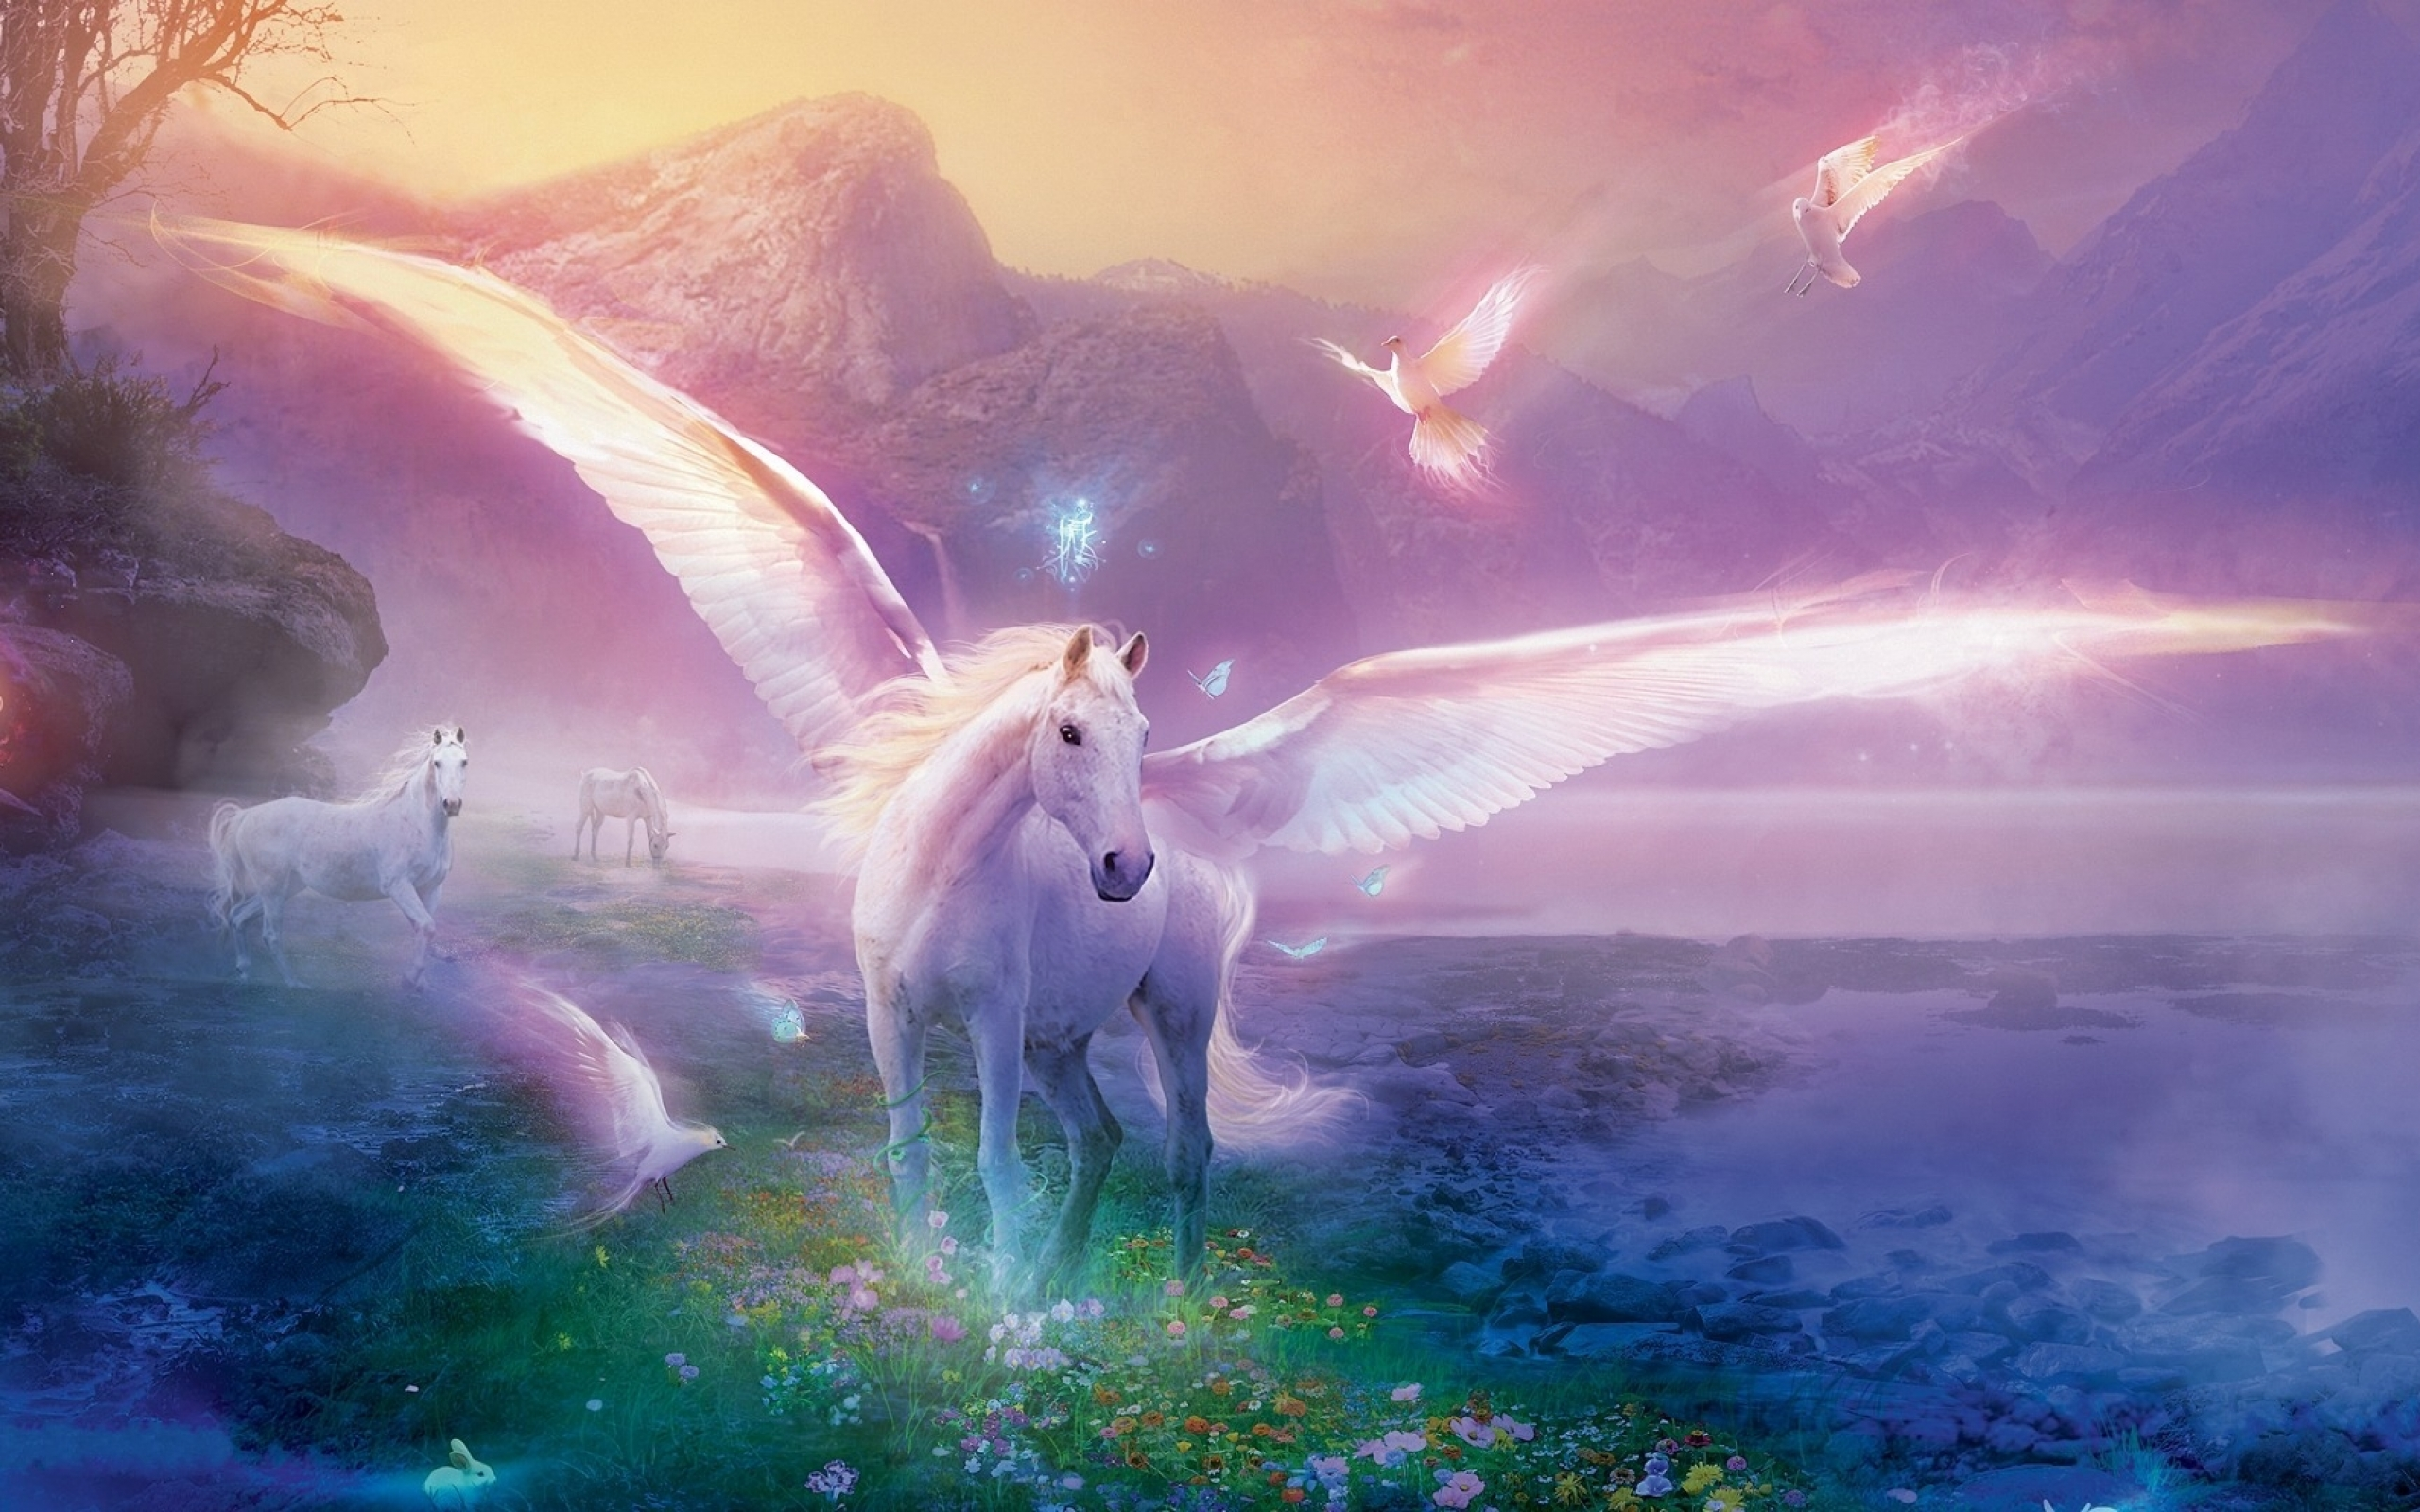 Hd wallpaper unicorn - 57 Unicorn Hd Wallpapers Backgrounds Wallpaper Abyss